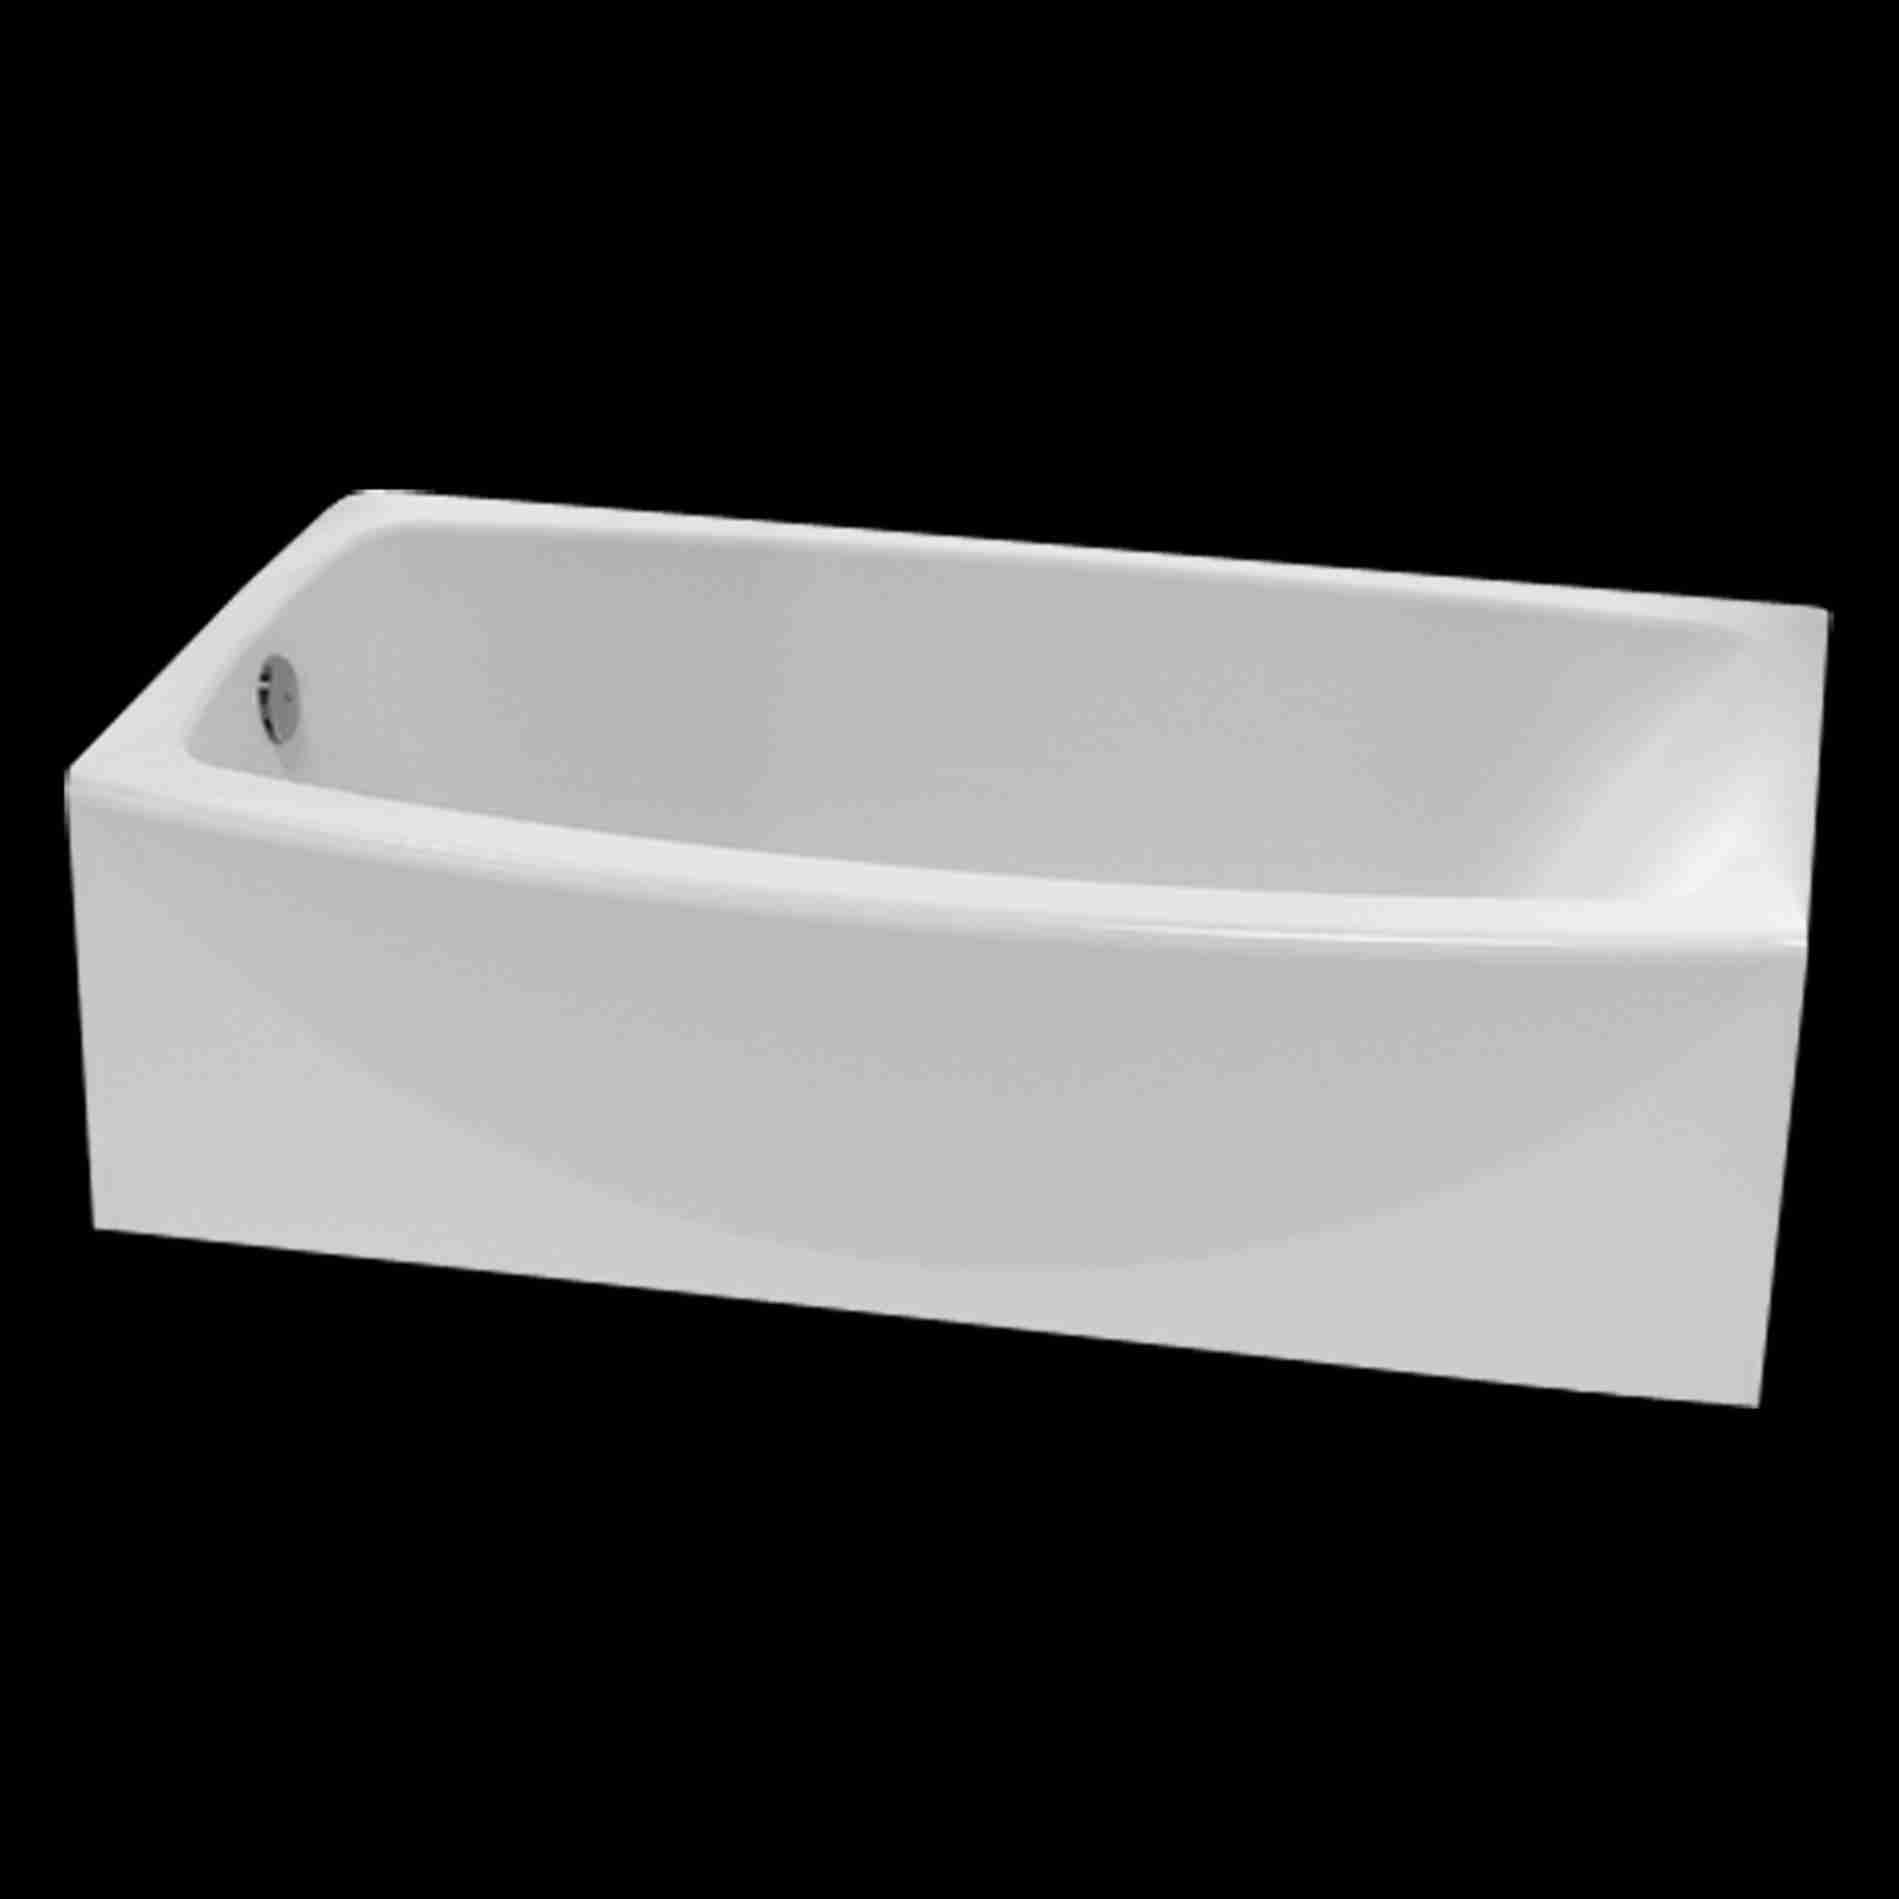 New Post Trending Bathtubs 54 Inches Long Visit Entermp3.info